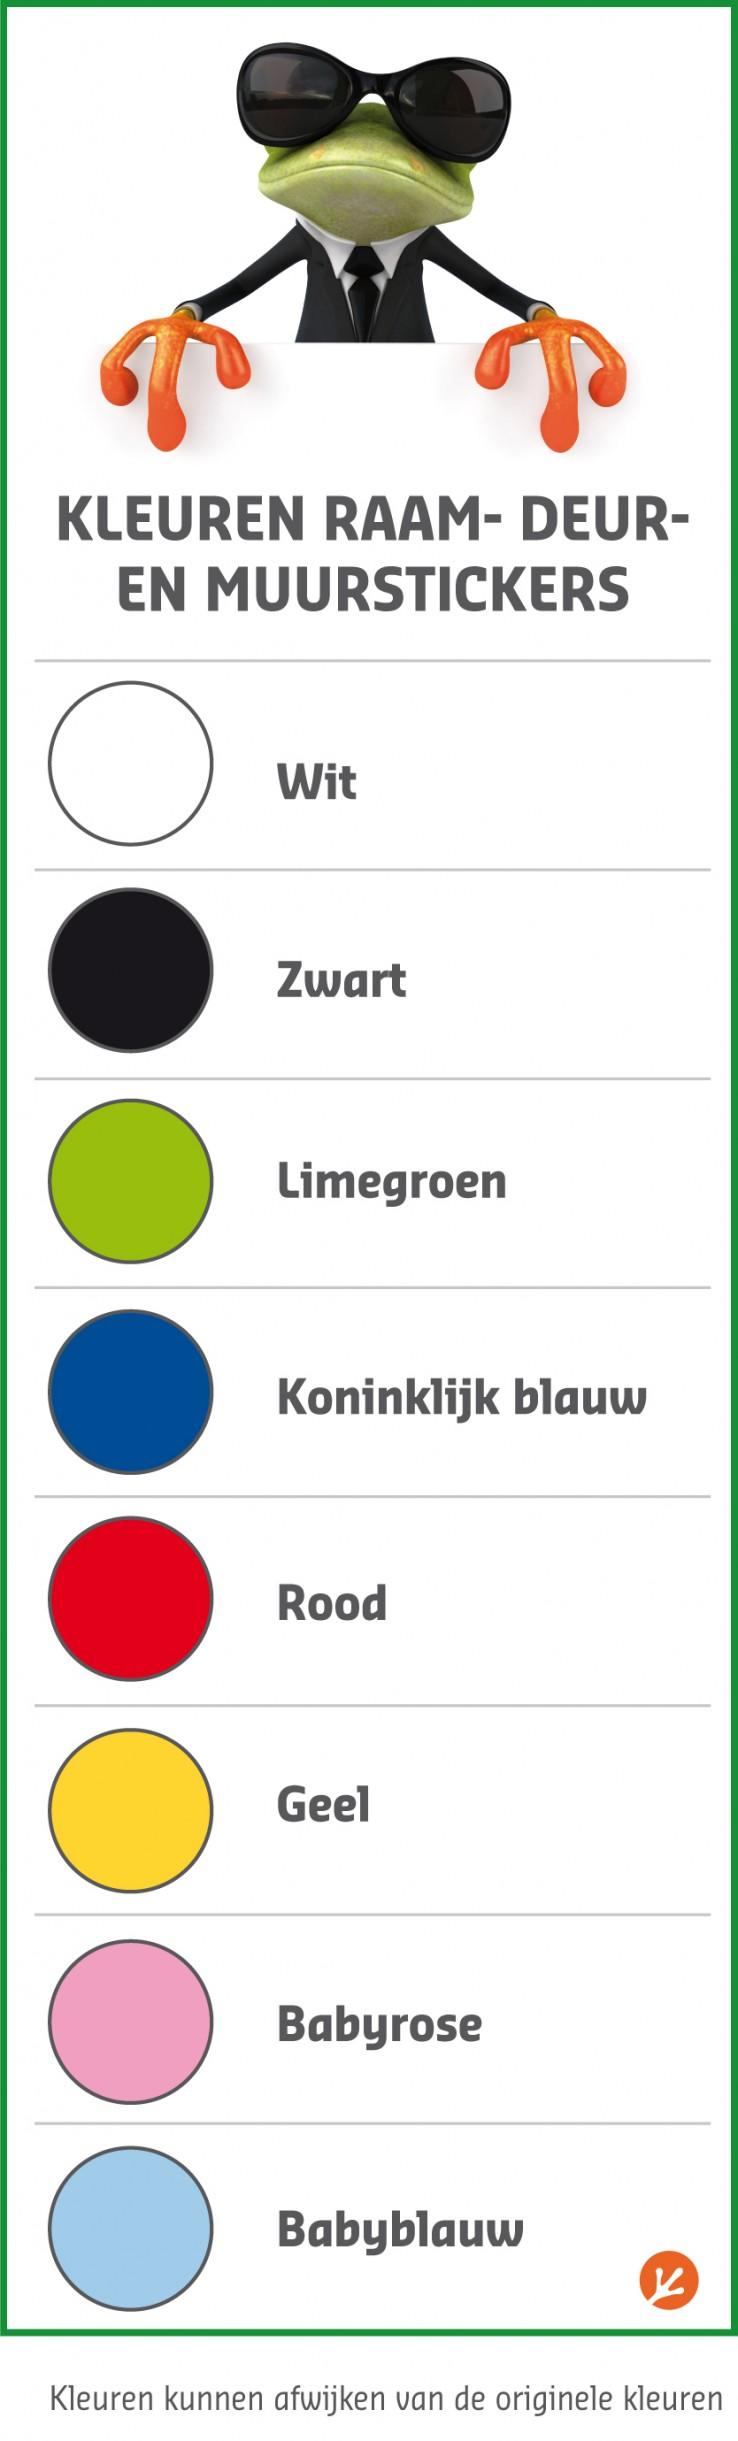 kleurenfoliestickers.jpg